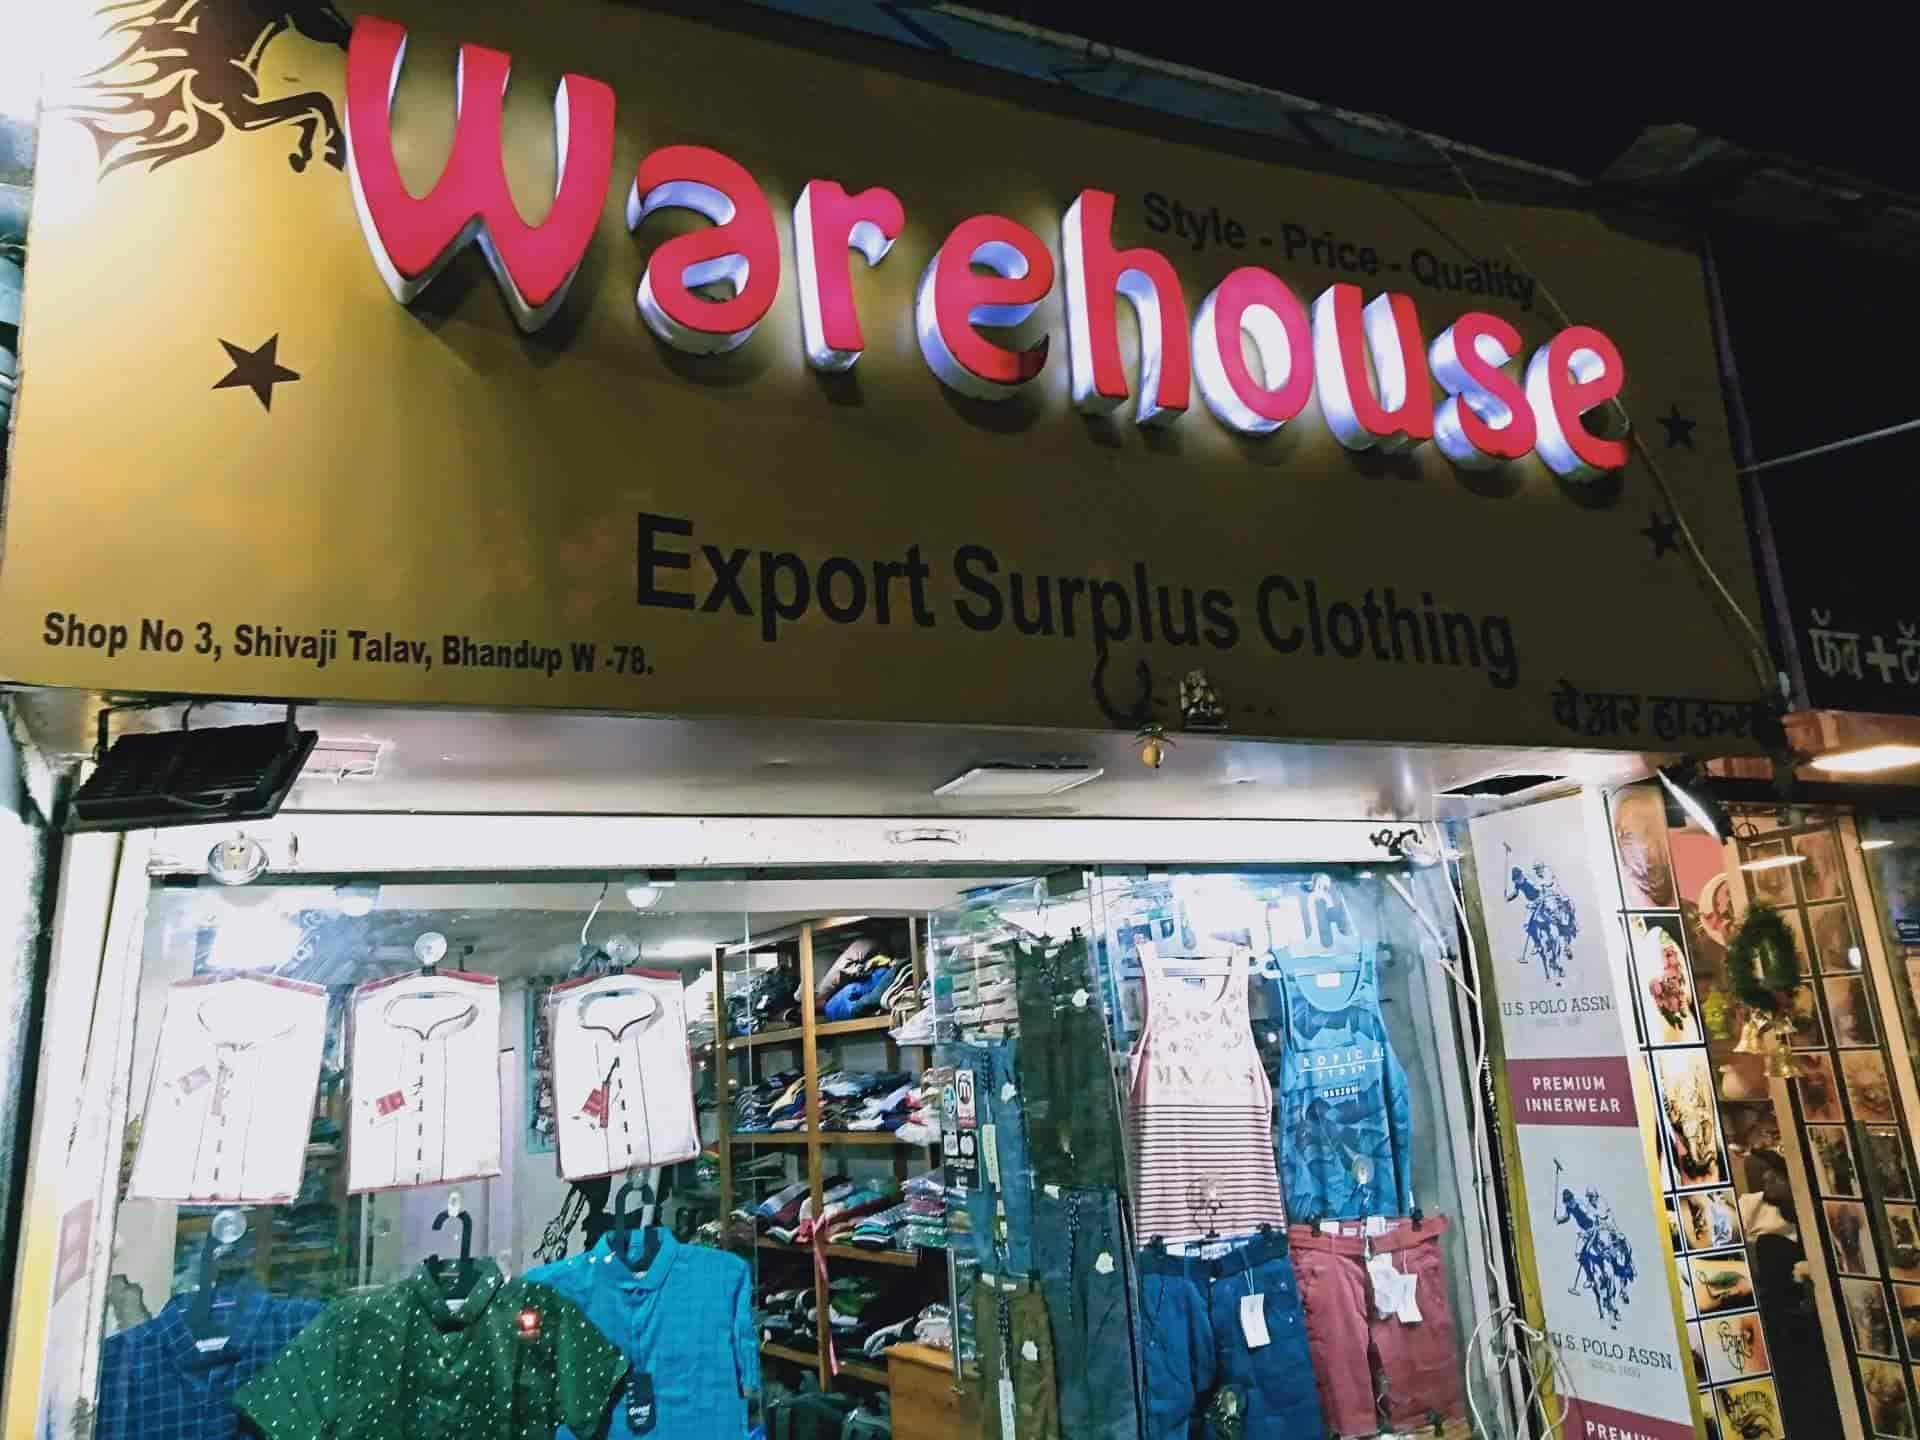 Warehouse Export Surplus, Bhandup West - T Shirt Wholesalers in